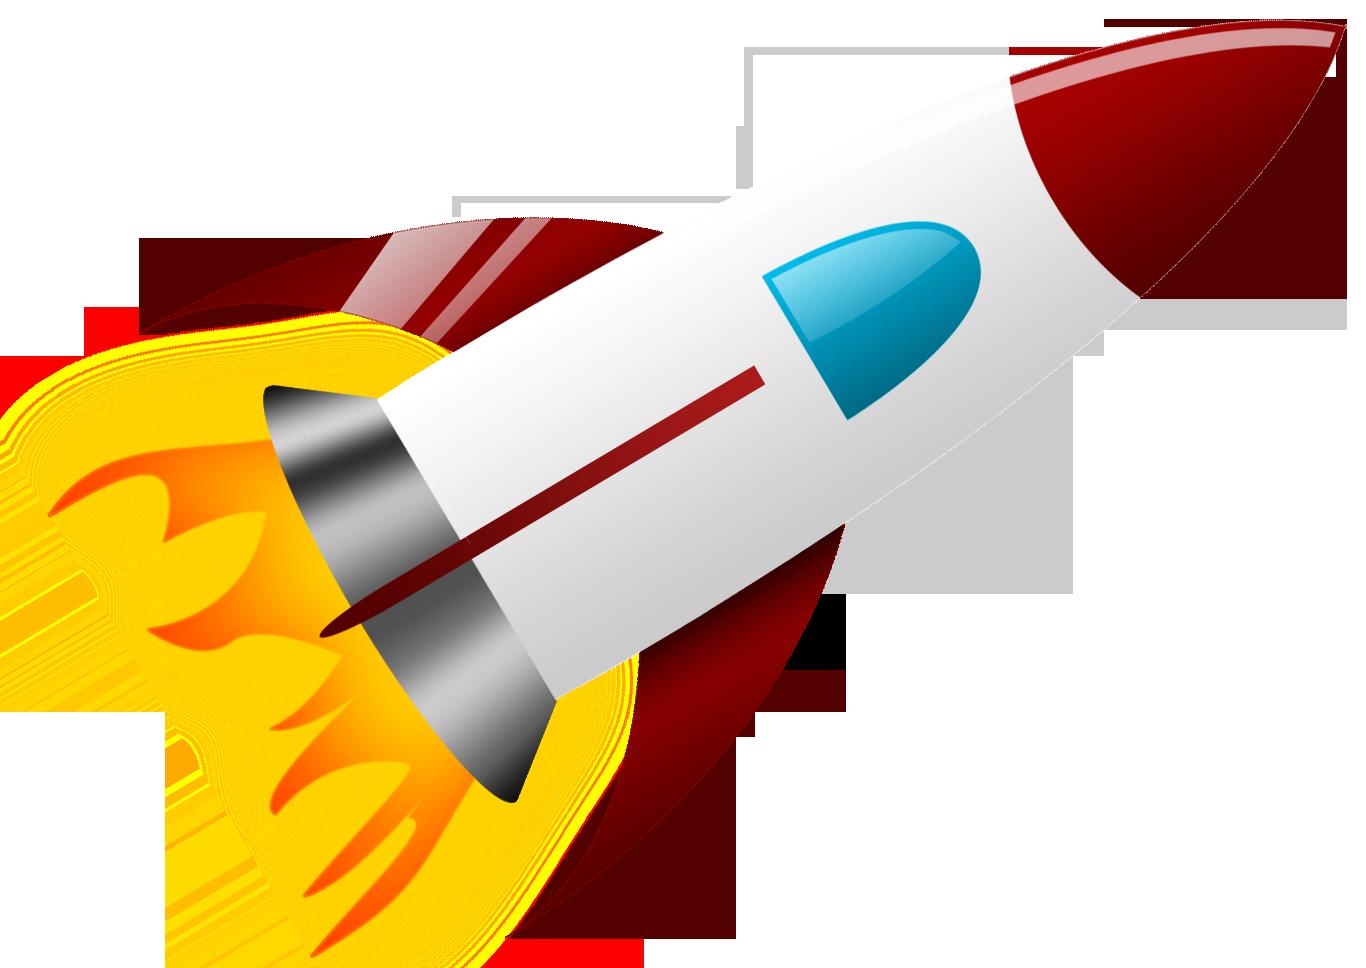 PNG HD Of Rockets - 123669